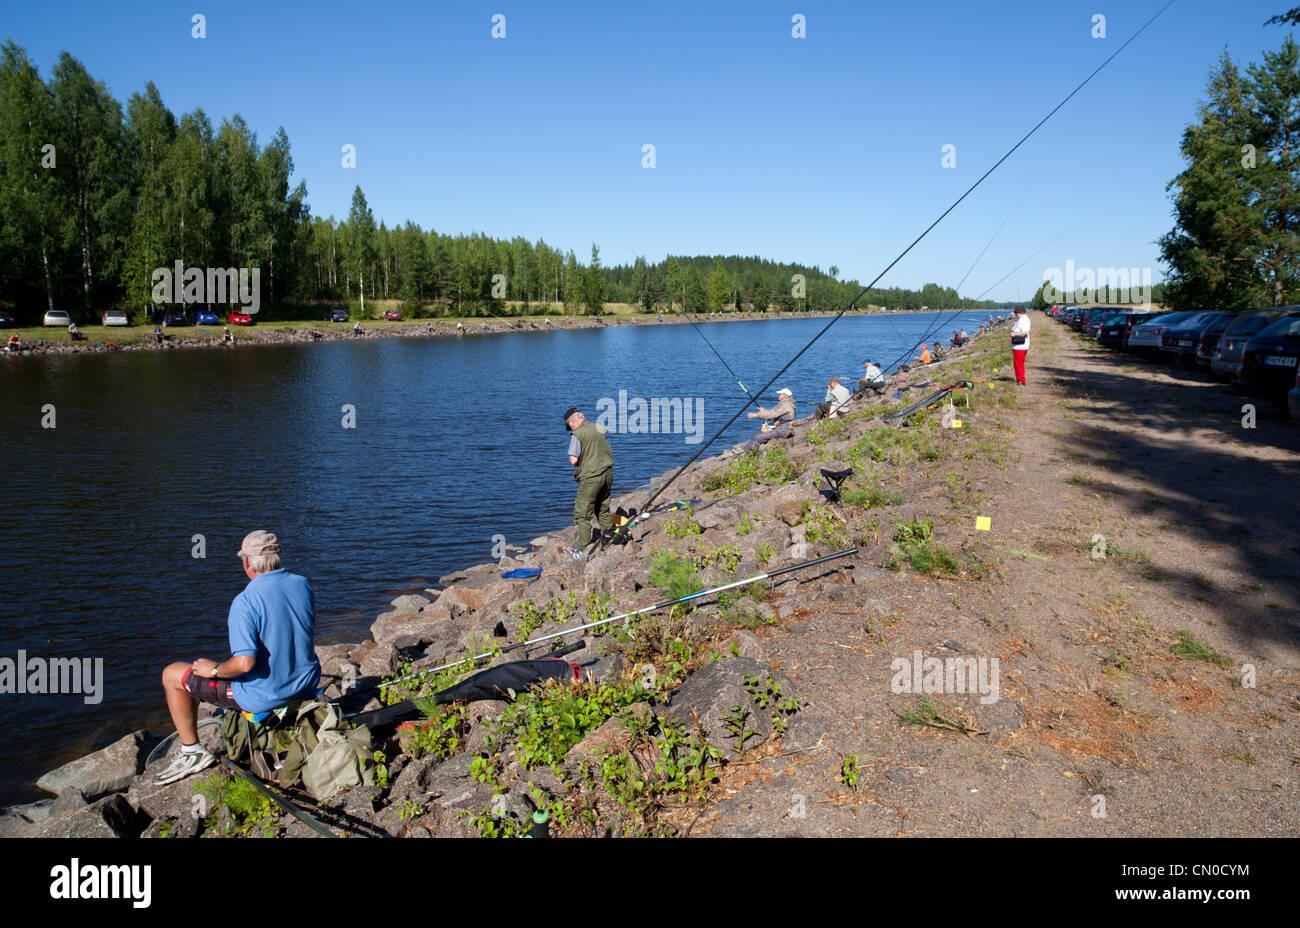 Finnish national championships of angling 2011 at Kansola Saimaa Canal. Veteran series (60+). , Finland - Stock Image